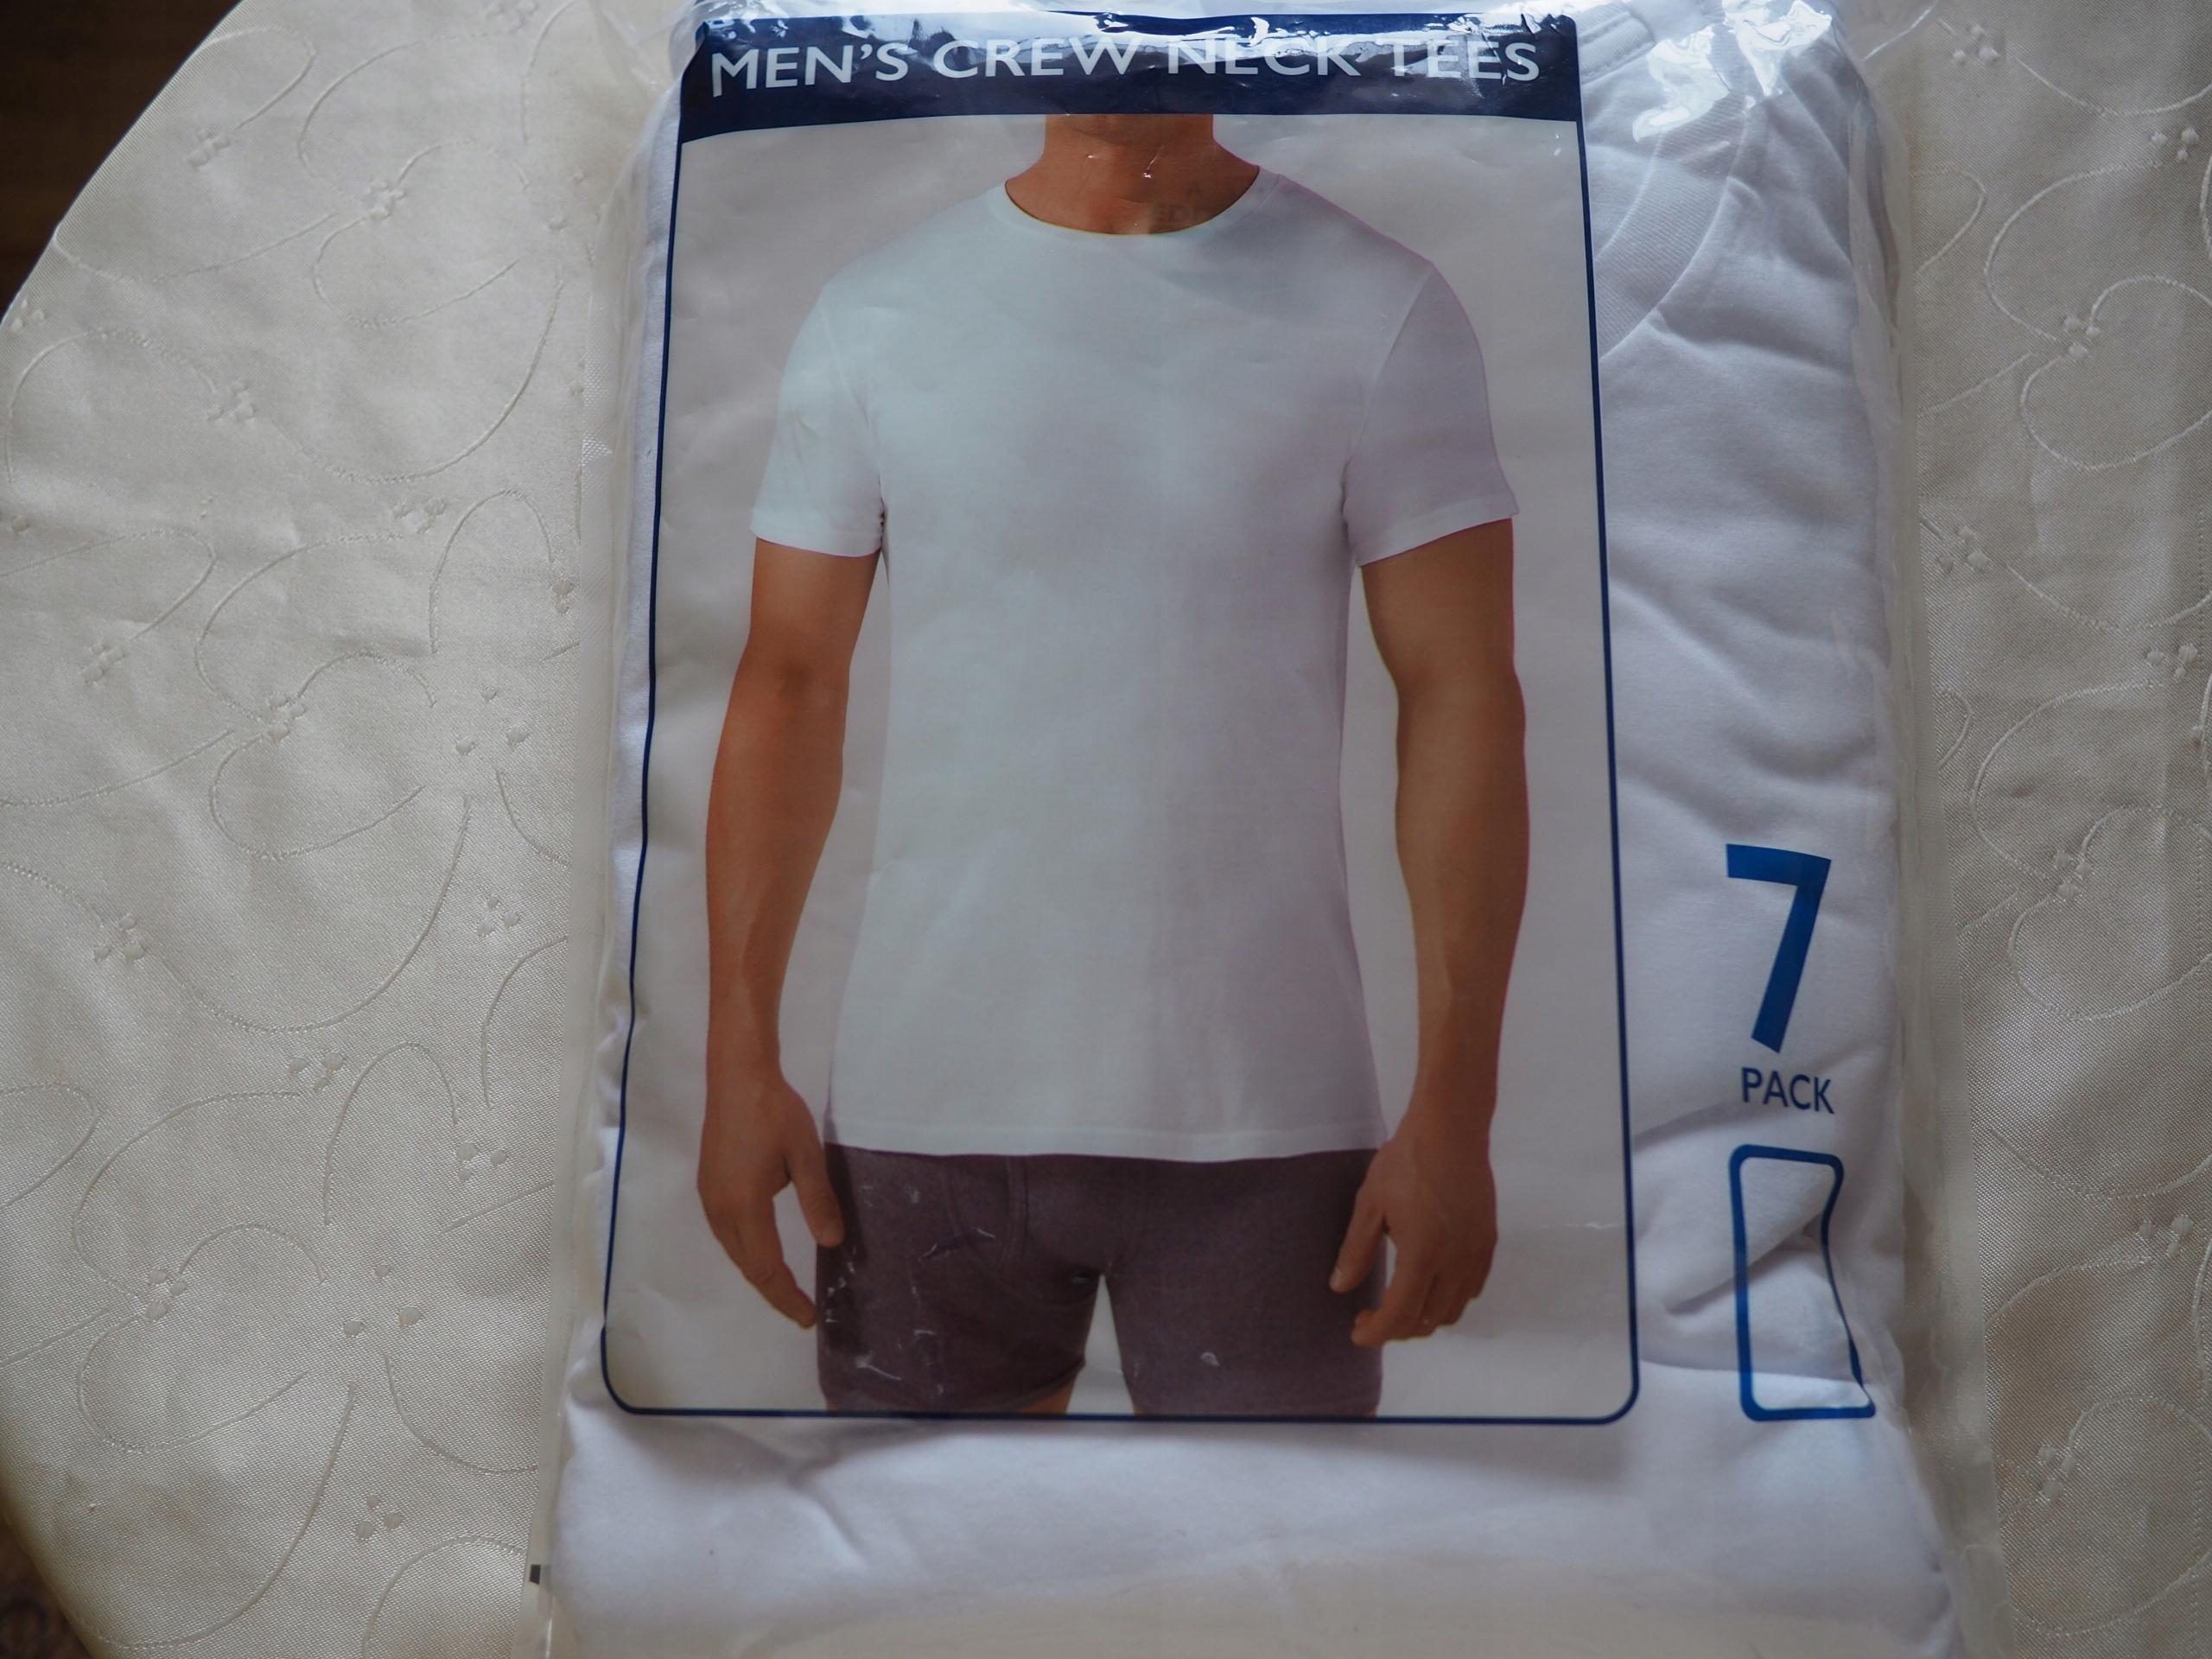 8dcc00a47b92 Basic Editions Men's T-Shirts ROZM.M 7-PACK - 7529988879 - oficjalne ...